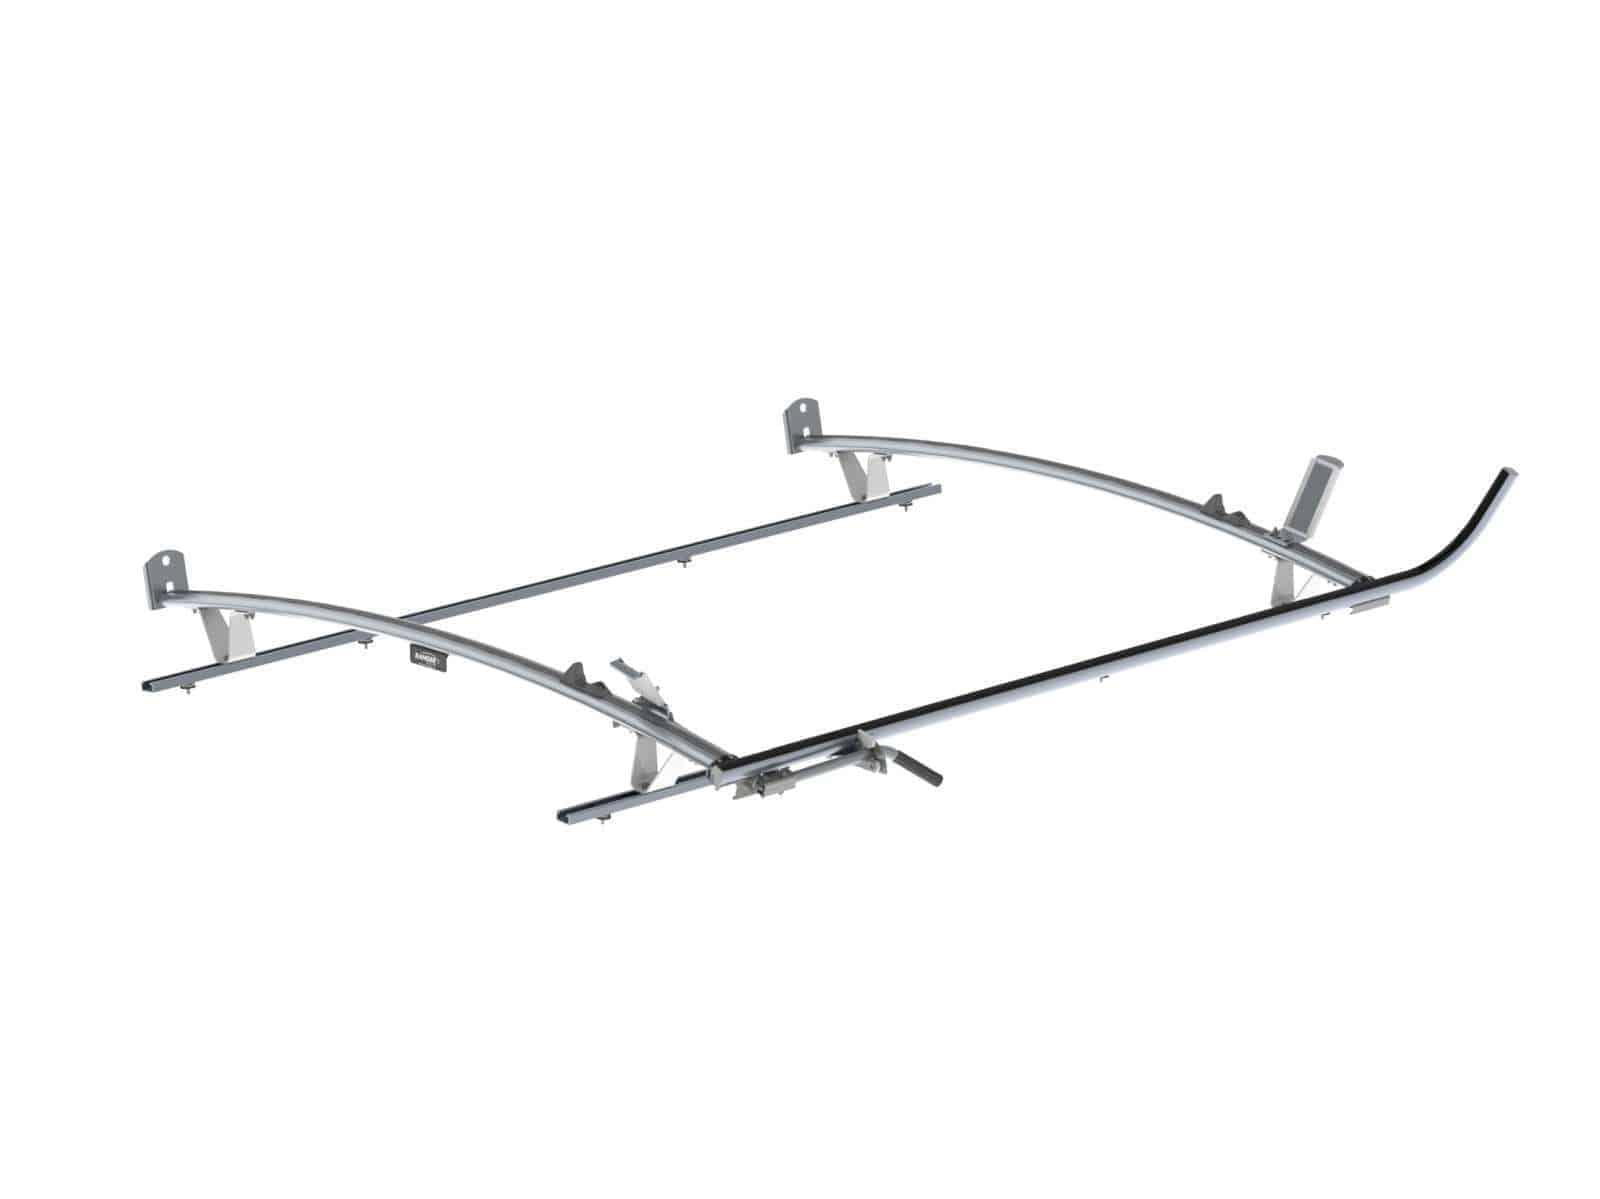 Single Side Ladder Rack For Ford Transit Lwb 2 Bar